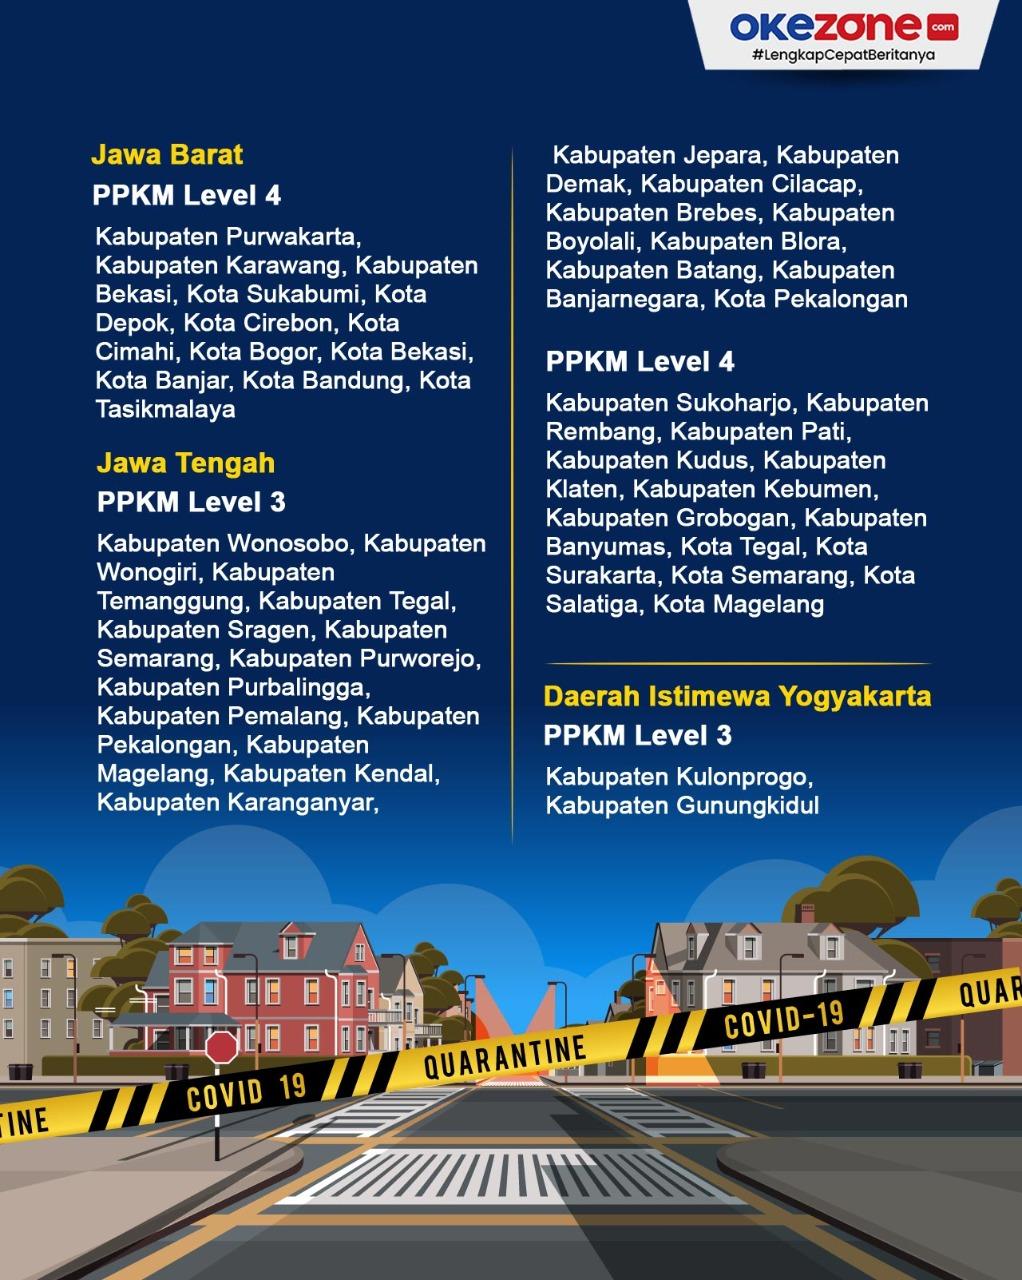 Daerah Jawa-Bali yang Wajib Terapkan PPKM Level 4 dan Level 3 -